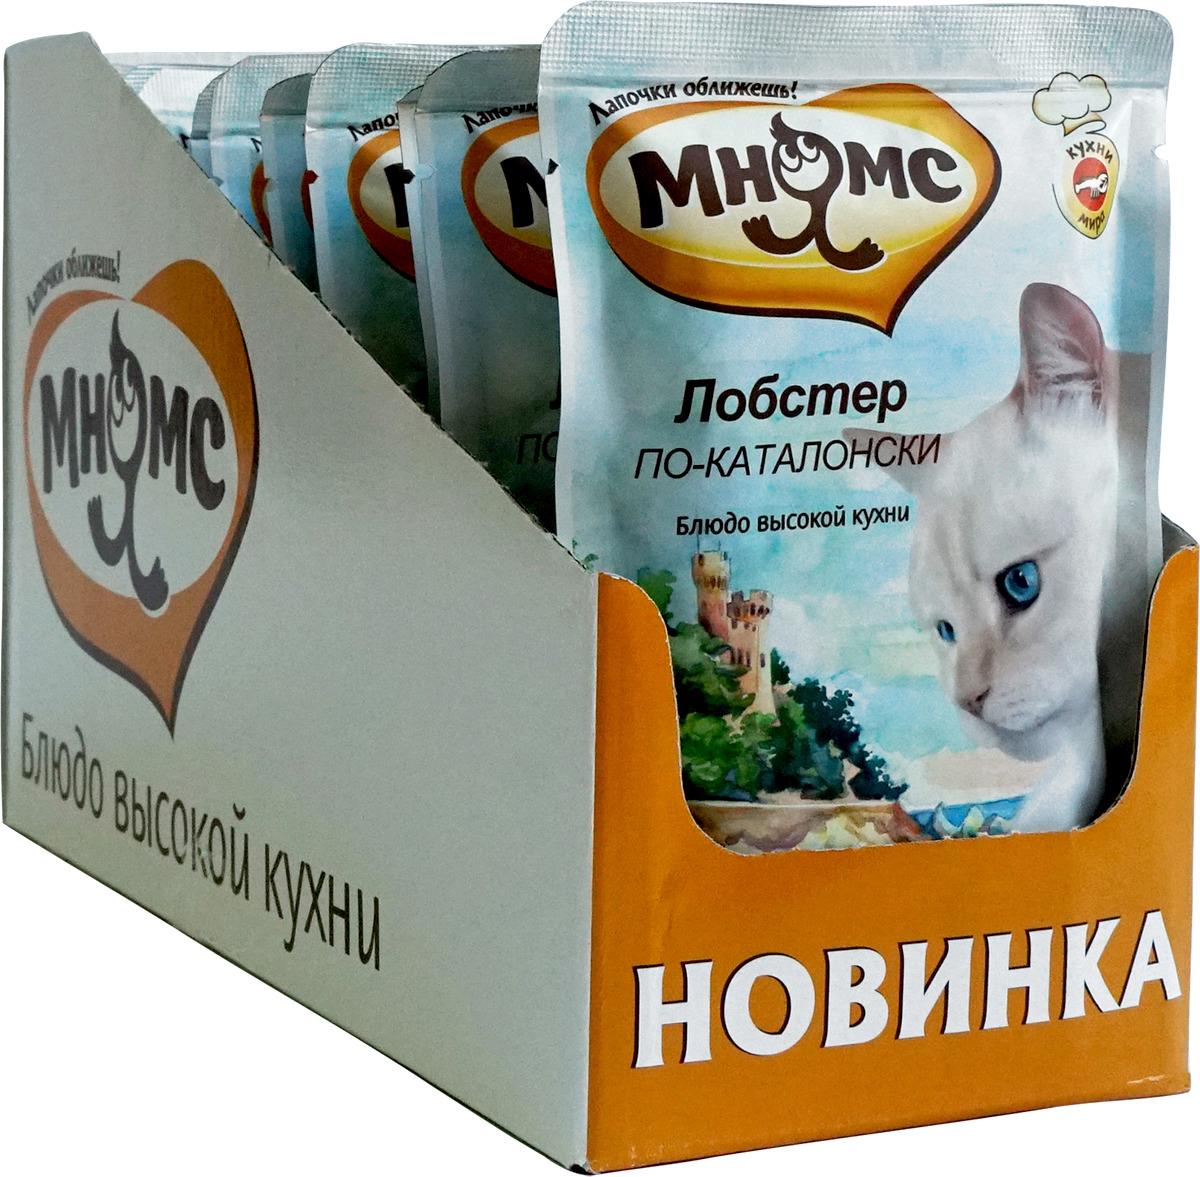 "Корм консервированный Мнямс ""Лобстер по-каталонски"", для кошек, 85 г х 12 шт"